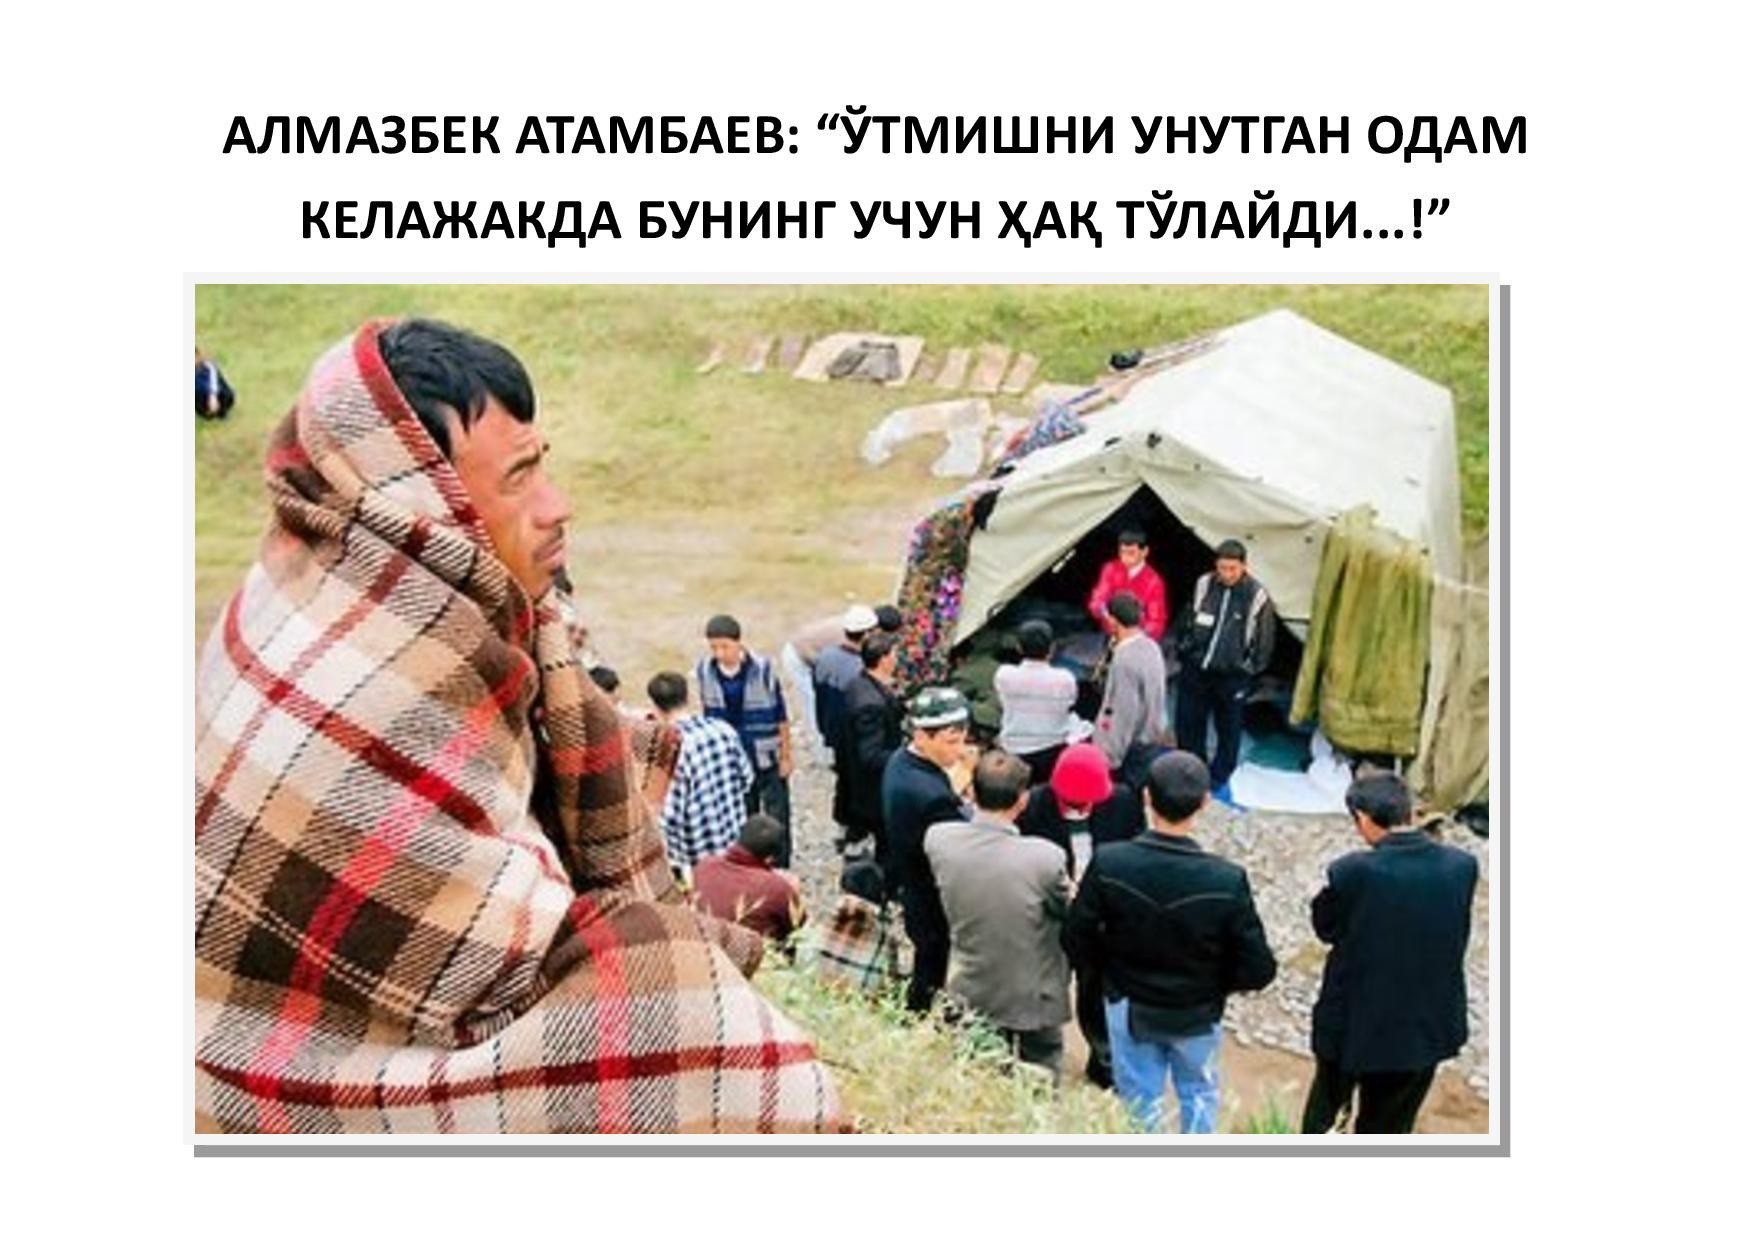 АТАМБАЕВ-page-001